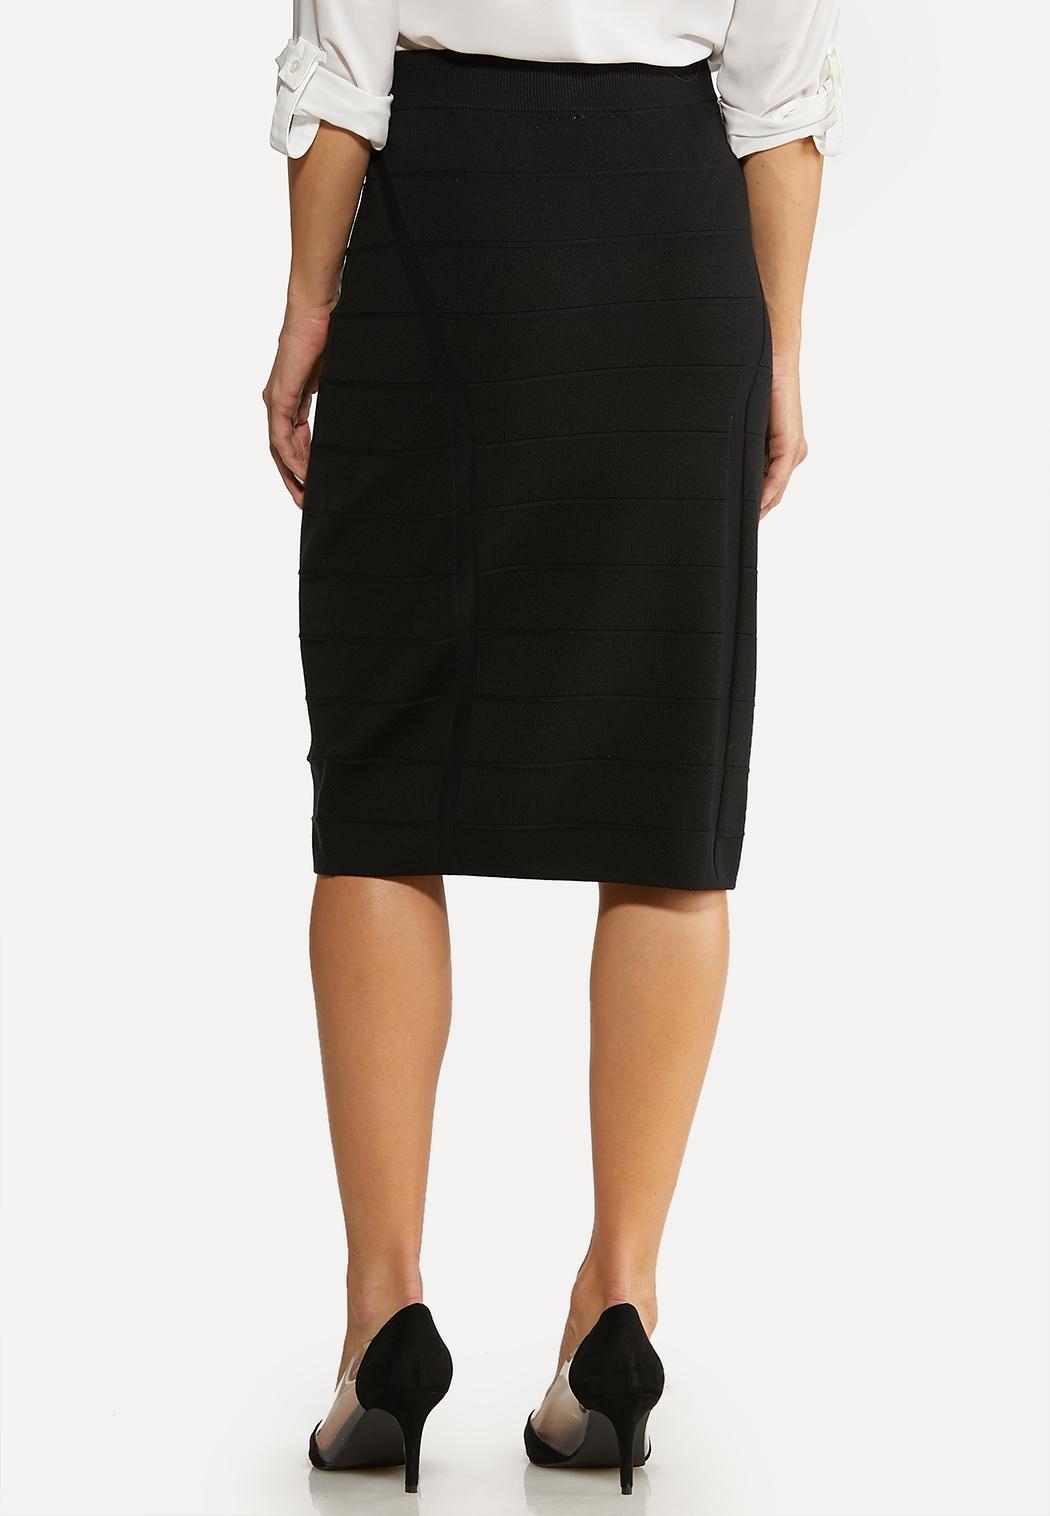 Black Knit Pencil Skirt (Item #44105590)